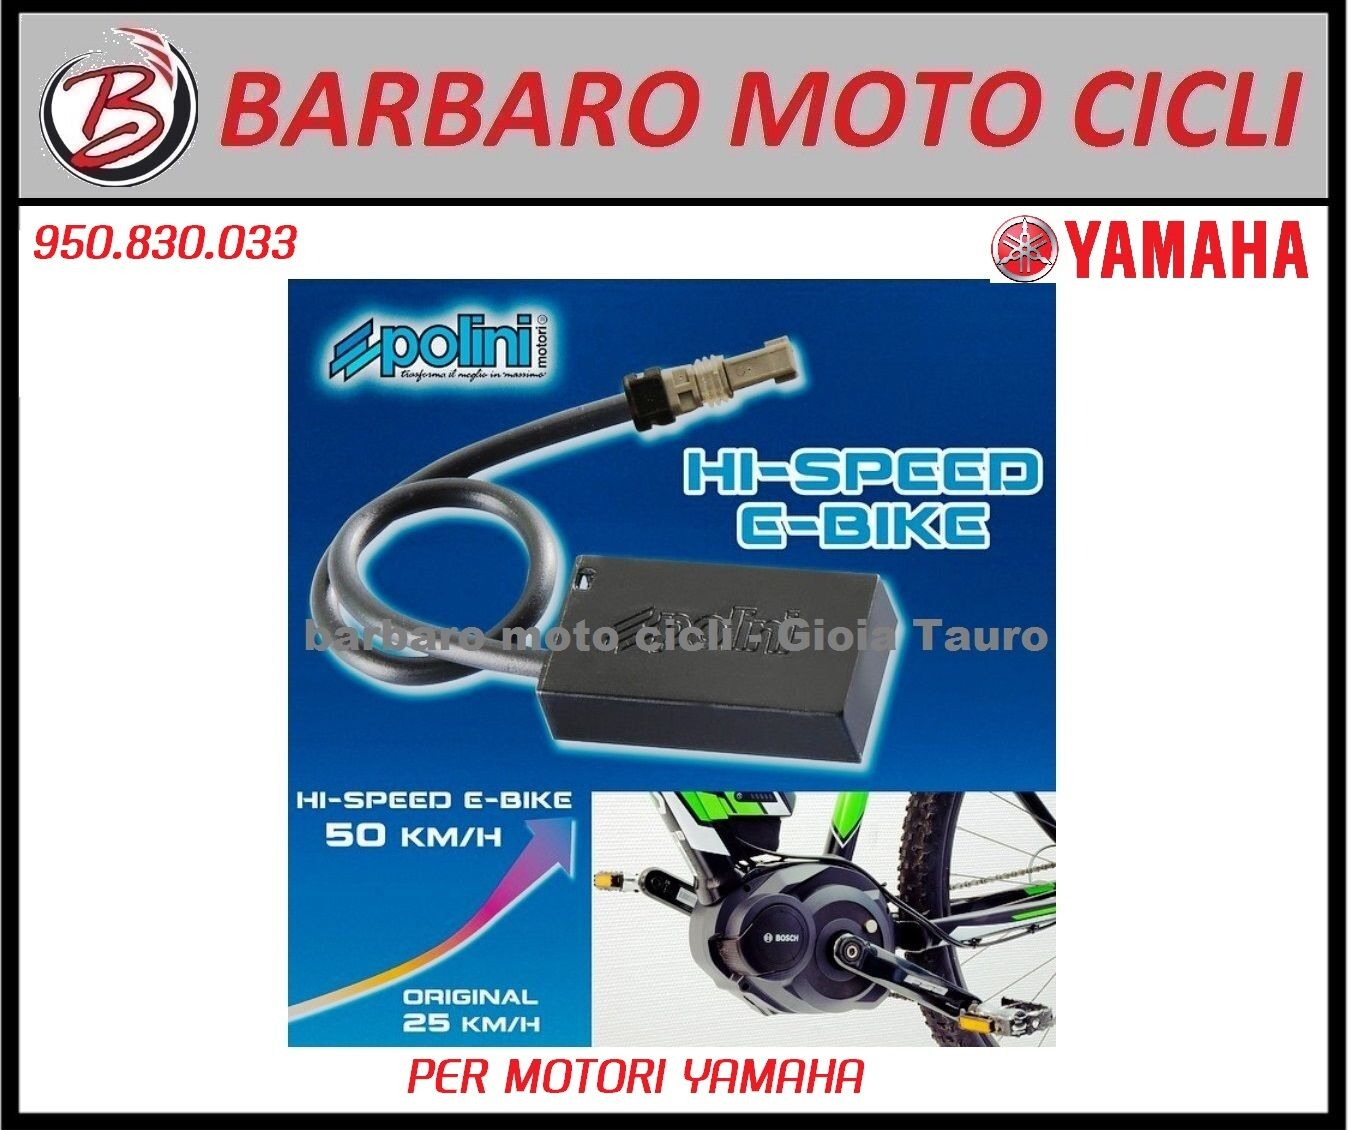 POLINI HI-SPEED Electric bike E-bike  YAMAHA SPEED' 50 km h 950.830.033  authentic quality